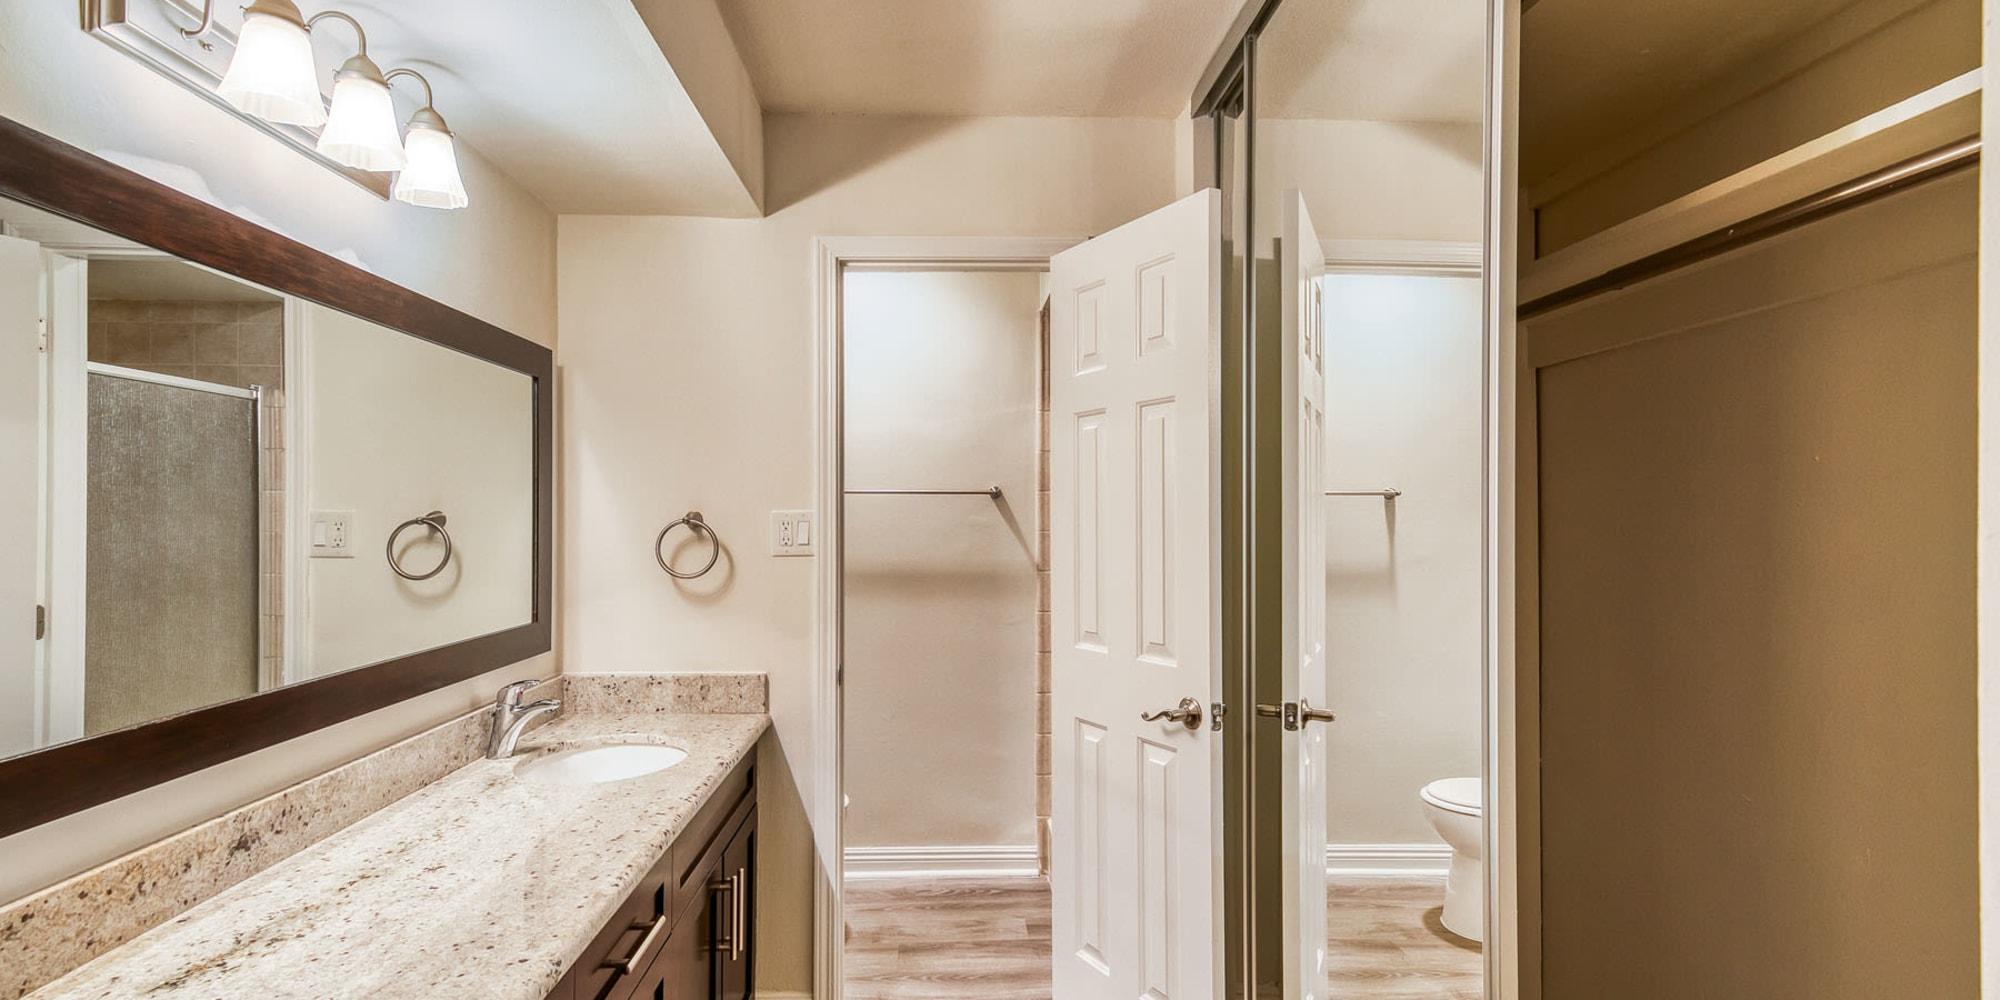 Closet storage in the primary bedroom's en suite bathroom in a model apartment at Mediterranean Village in West Hollywood, California